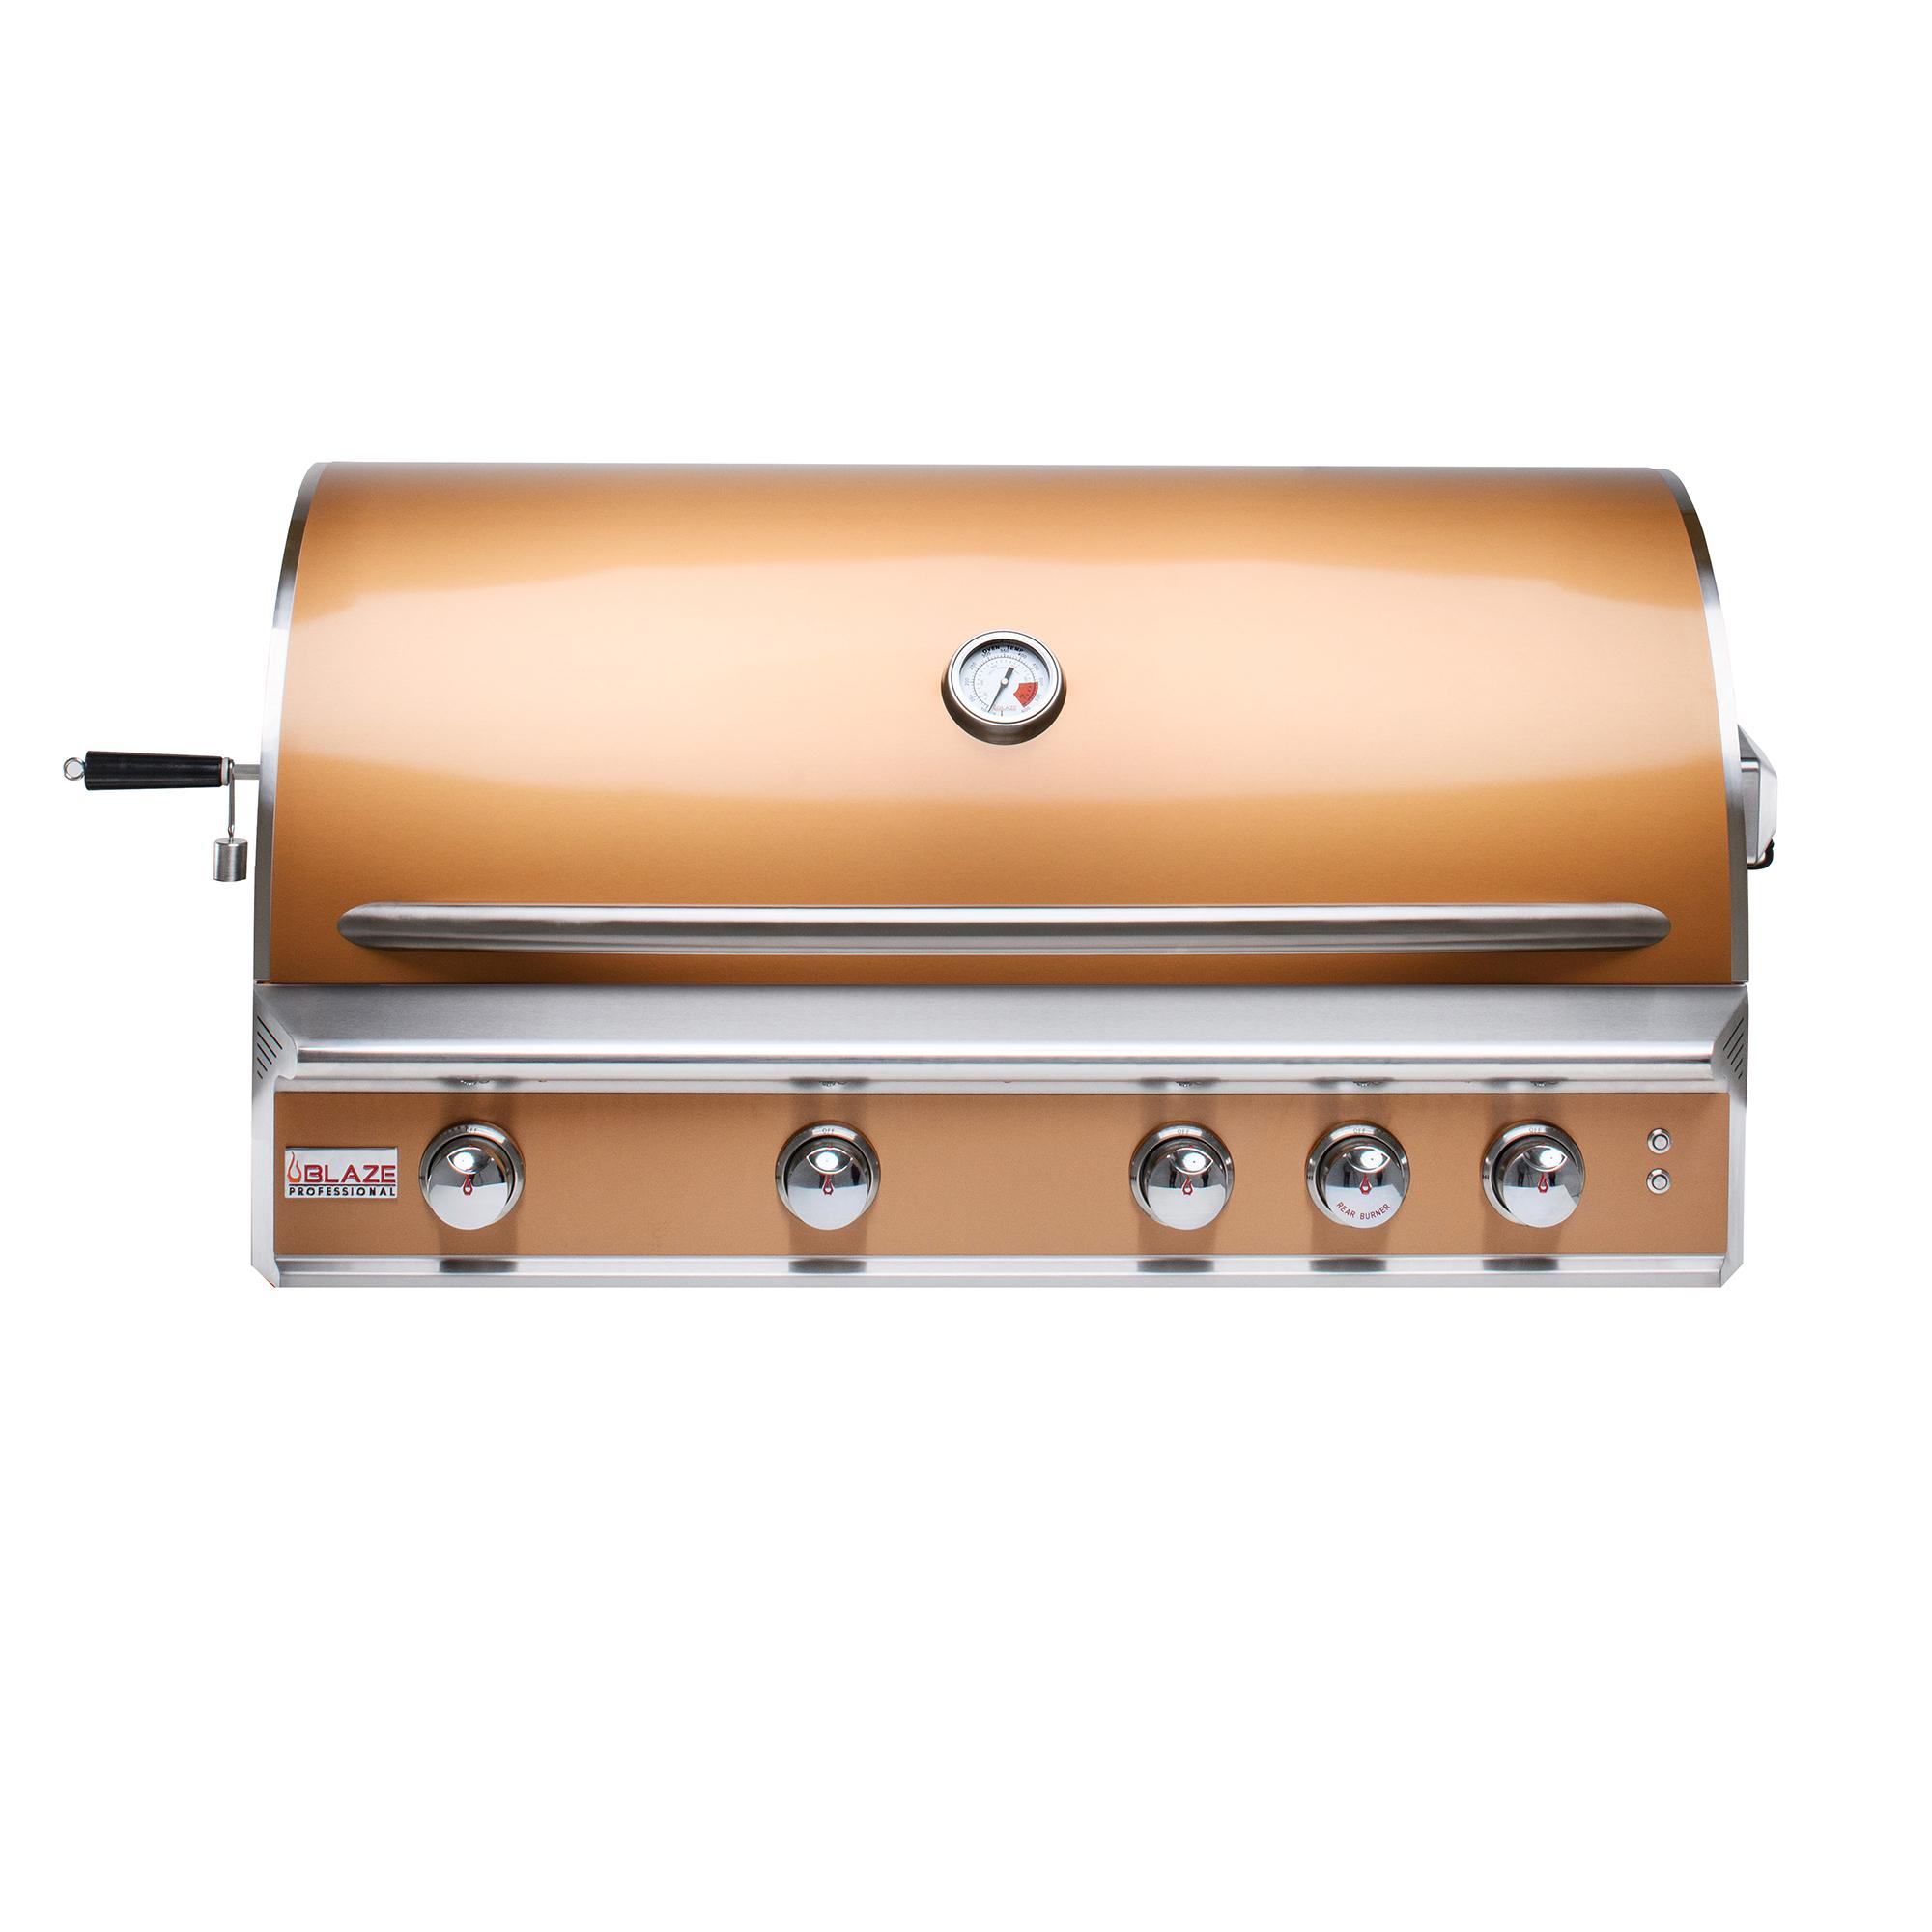 Blaze-grill-skin-RoseGold-built-in-2000px